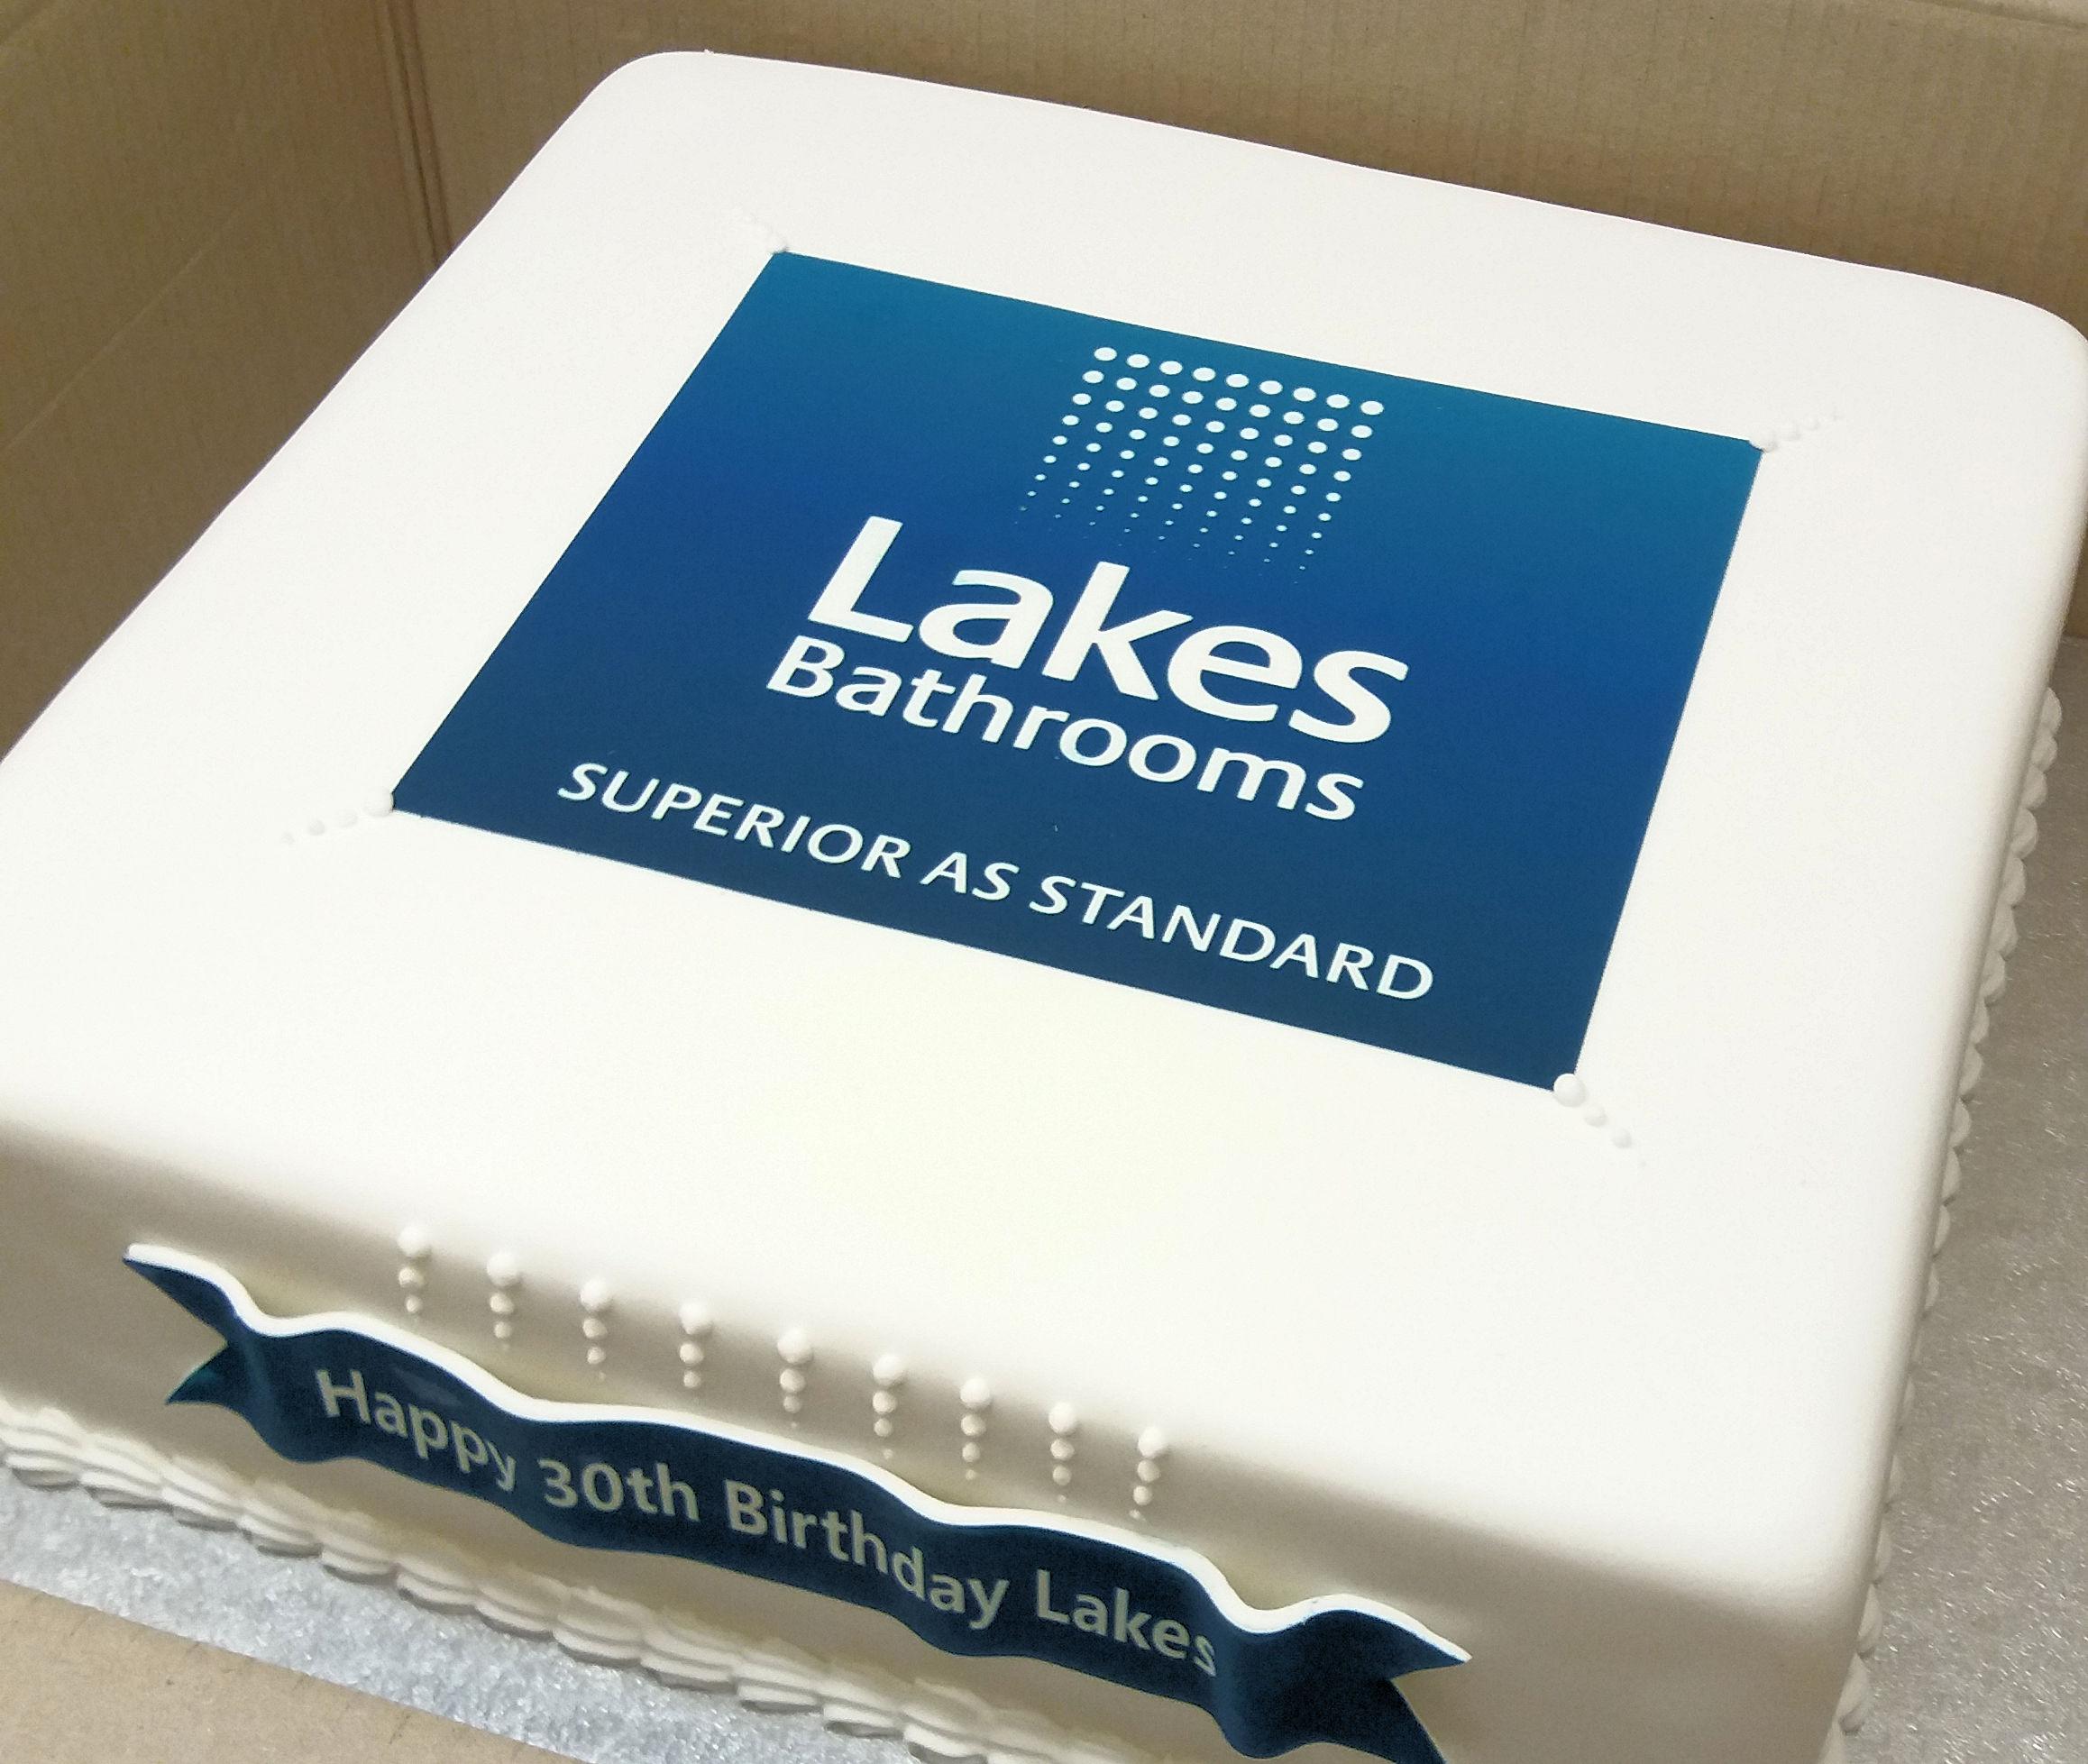 lakes corporate cake.jpg